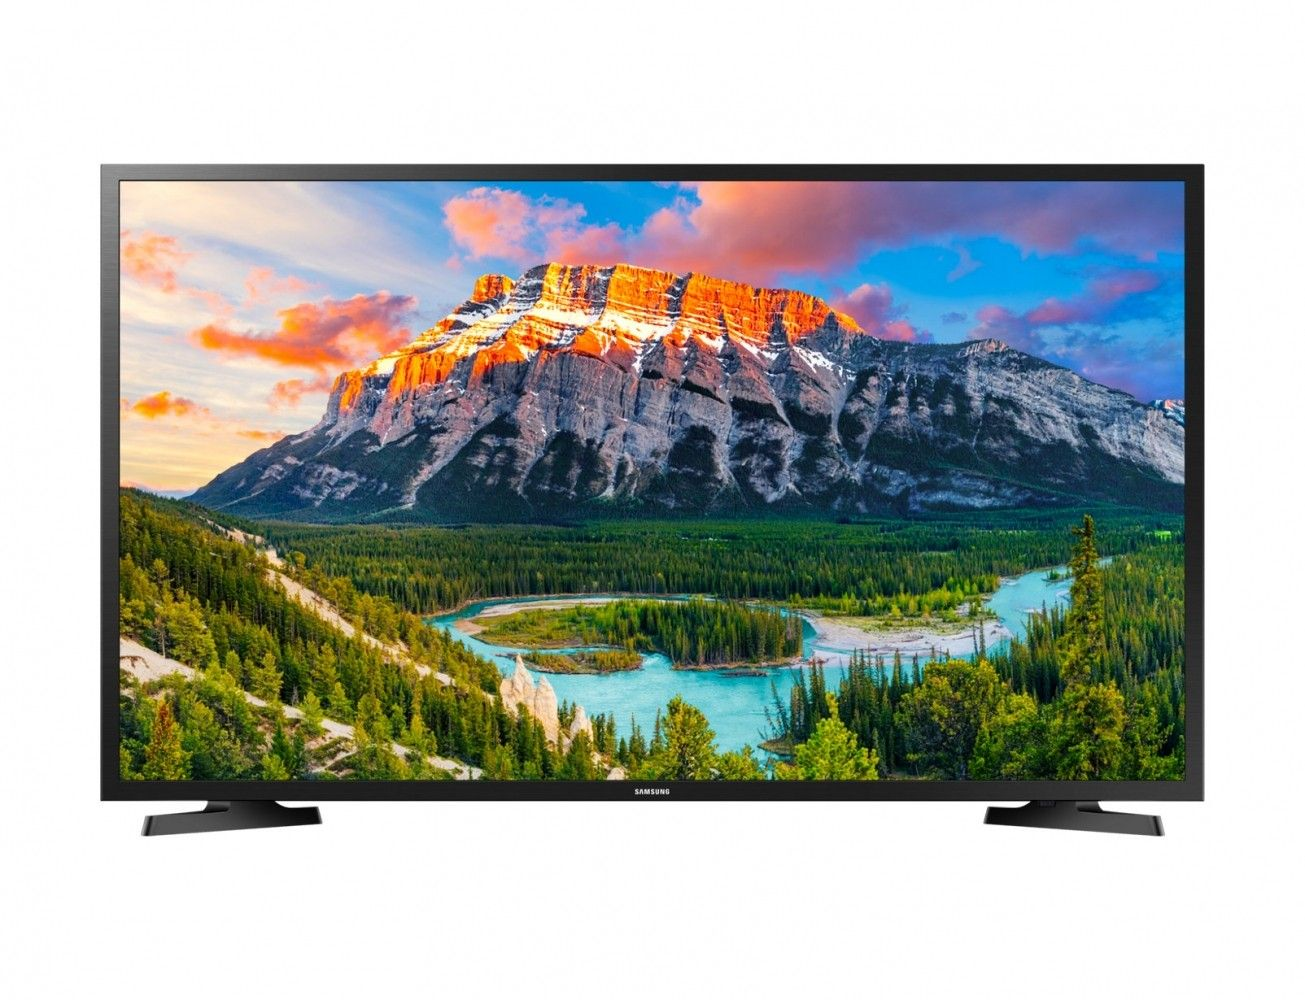 Купить Телевизоры, Телевизор Samsung UE43N5300AUXUA